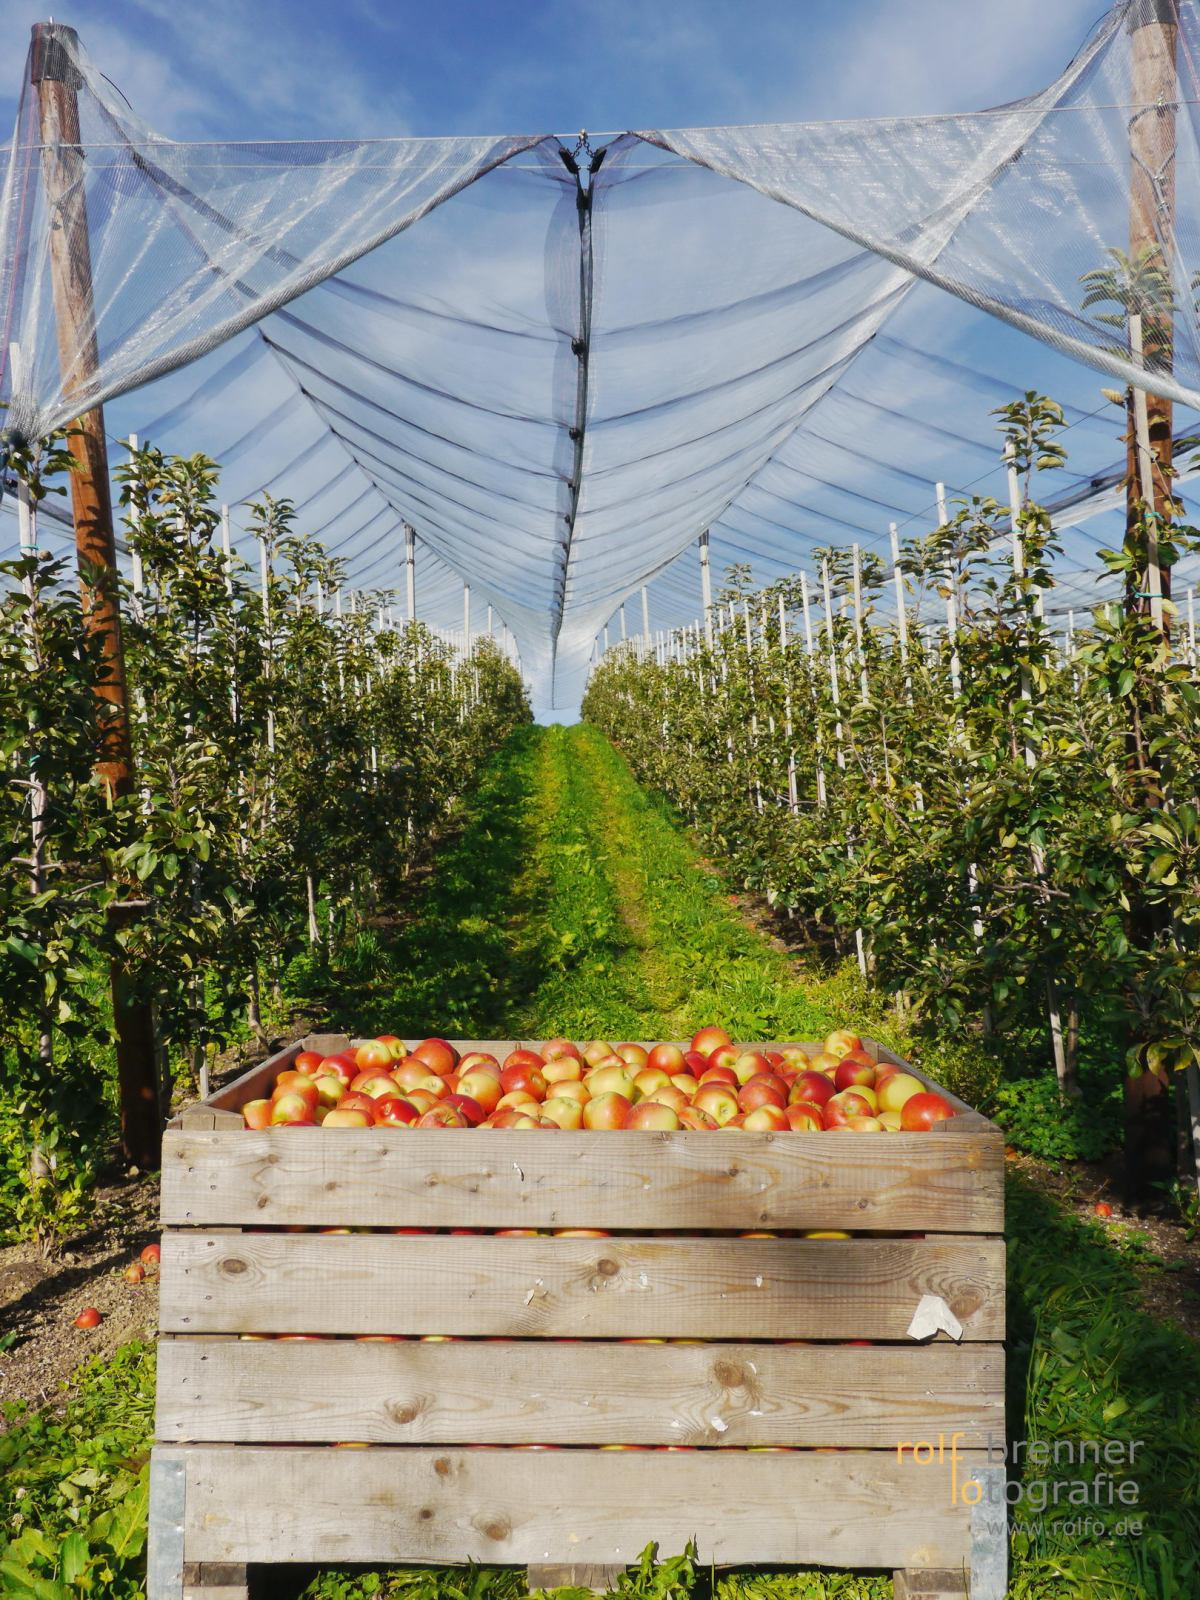 Apfelernte bei Kressbronn am Bodensee